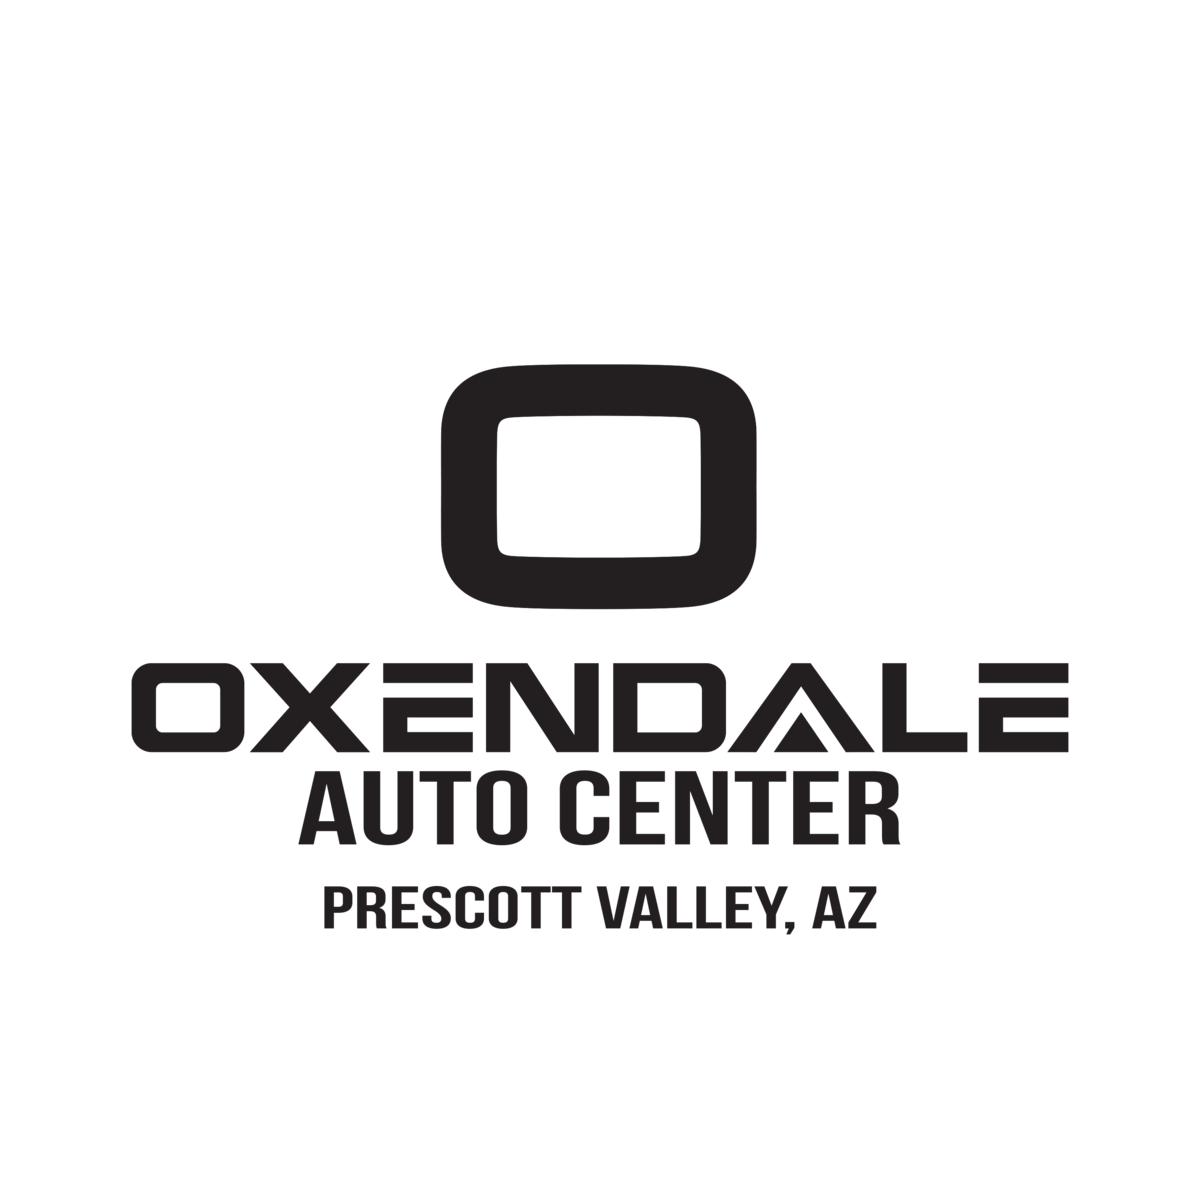 Oxendale Auto Center Prescott Valley Az Read Consumer Reviews